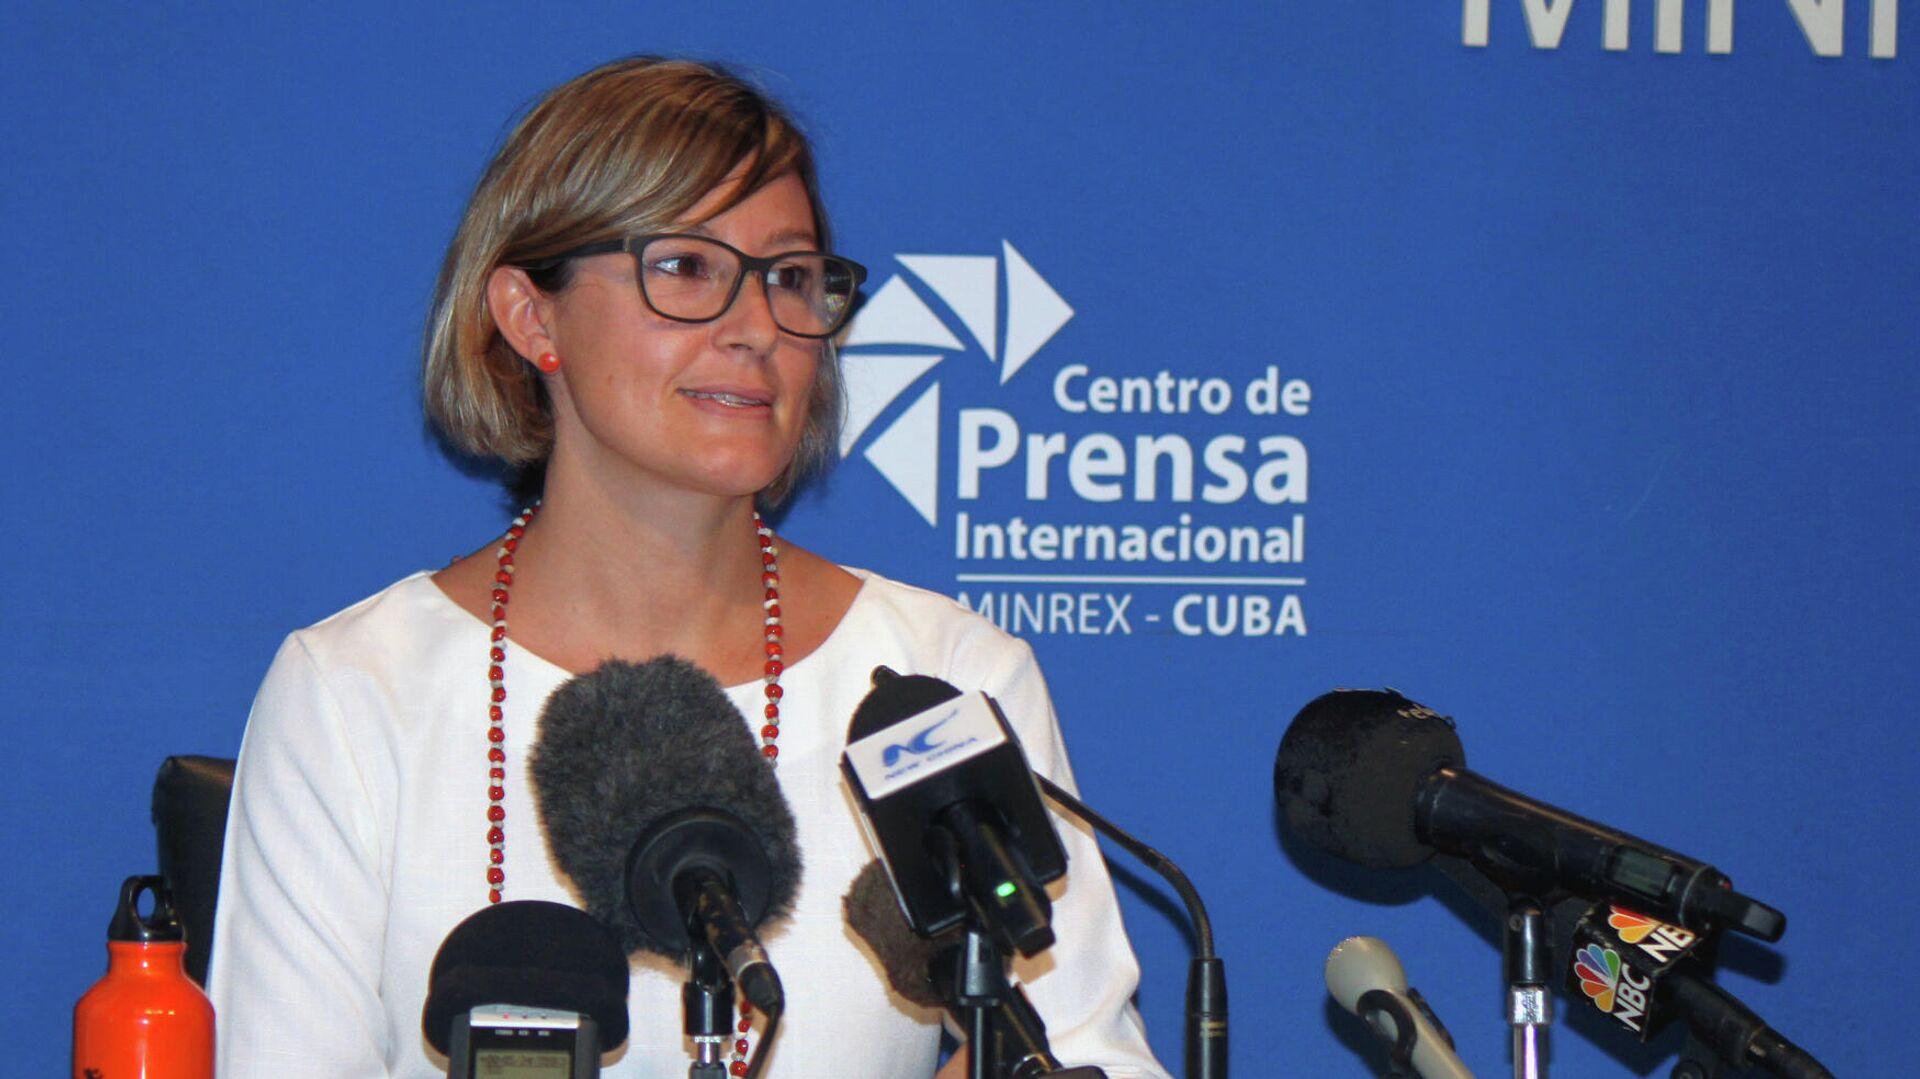 Elena Gentili, directora de OXFAM en Cuba - Sputnik Mundo, 1920, 26.05.2021